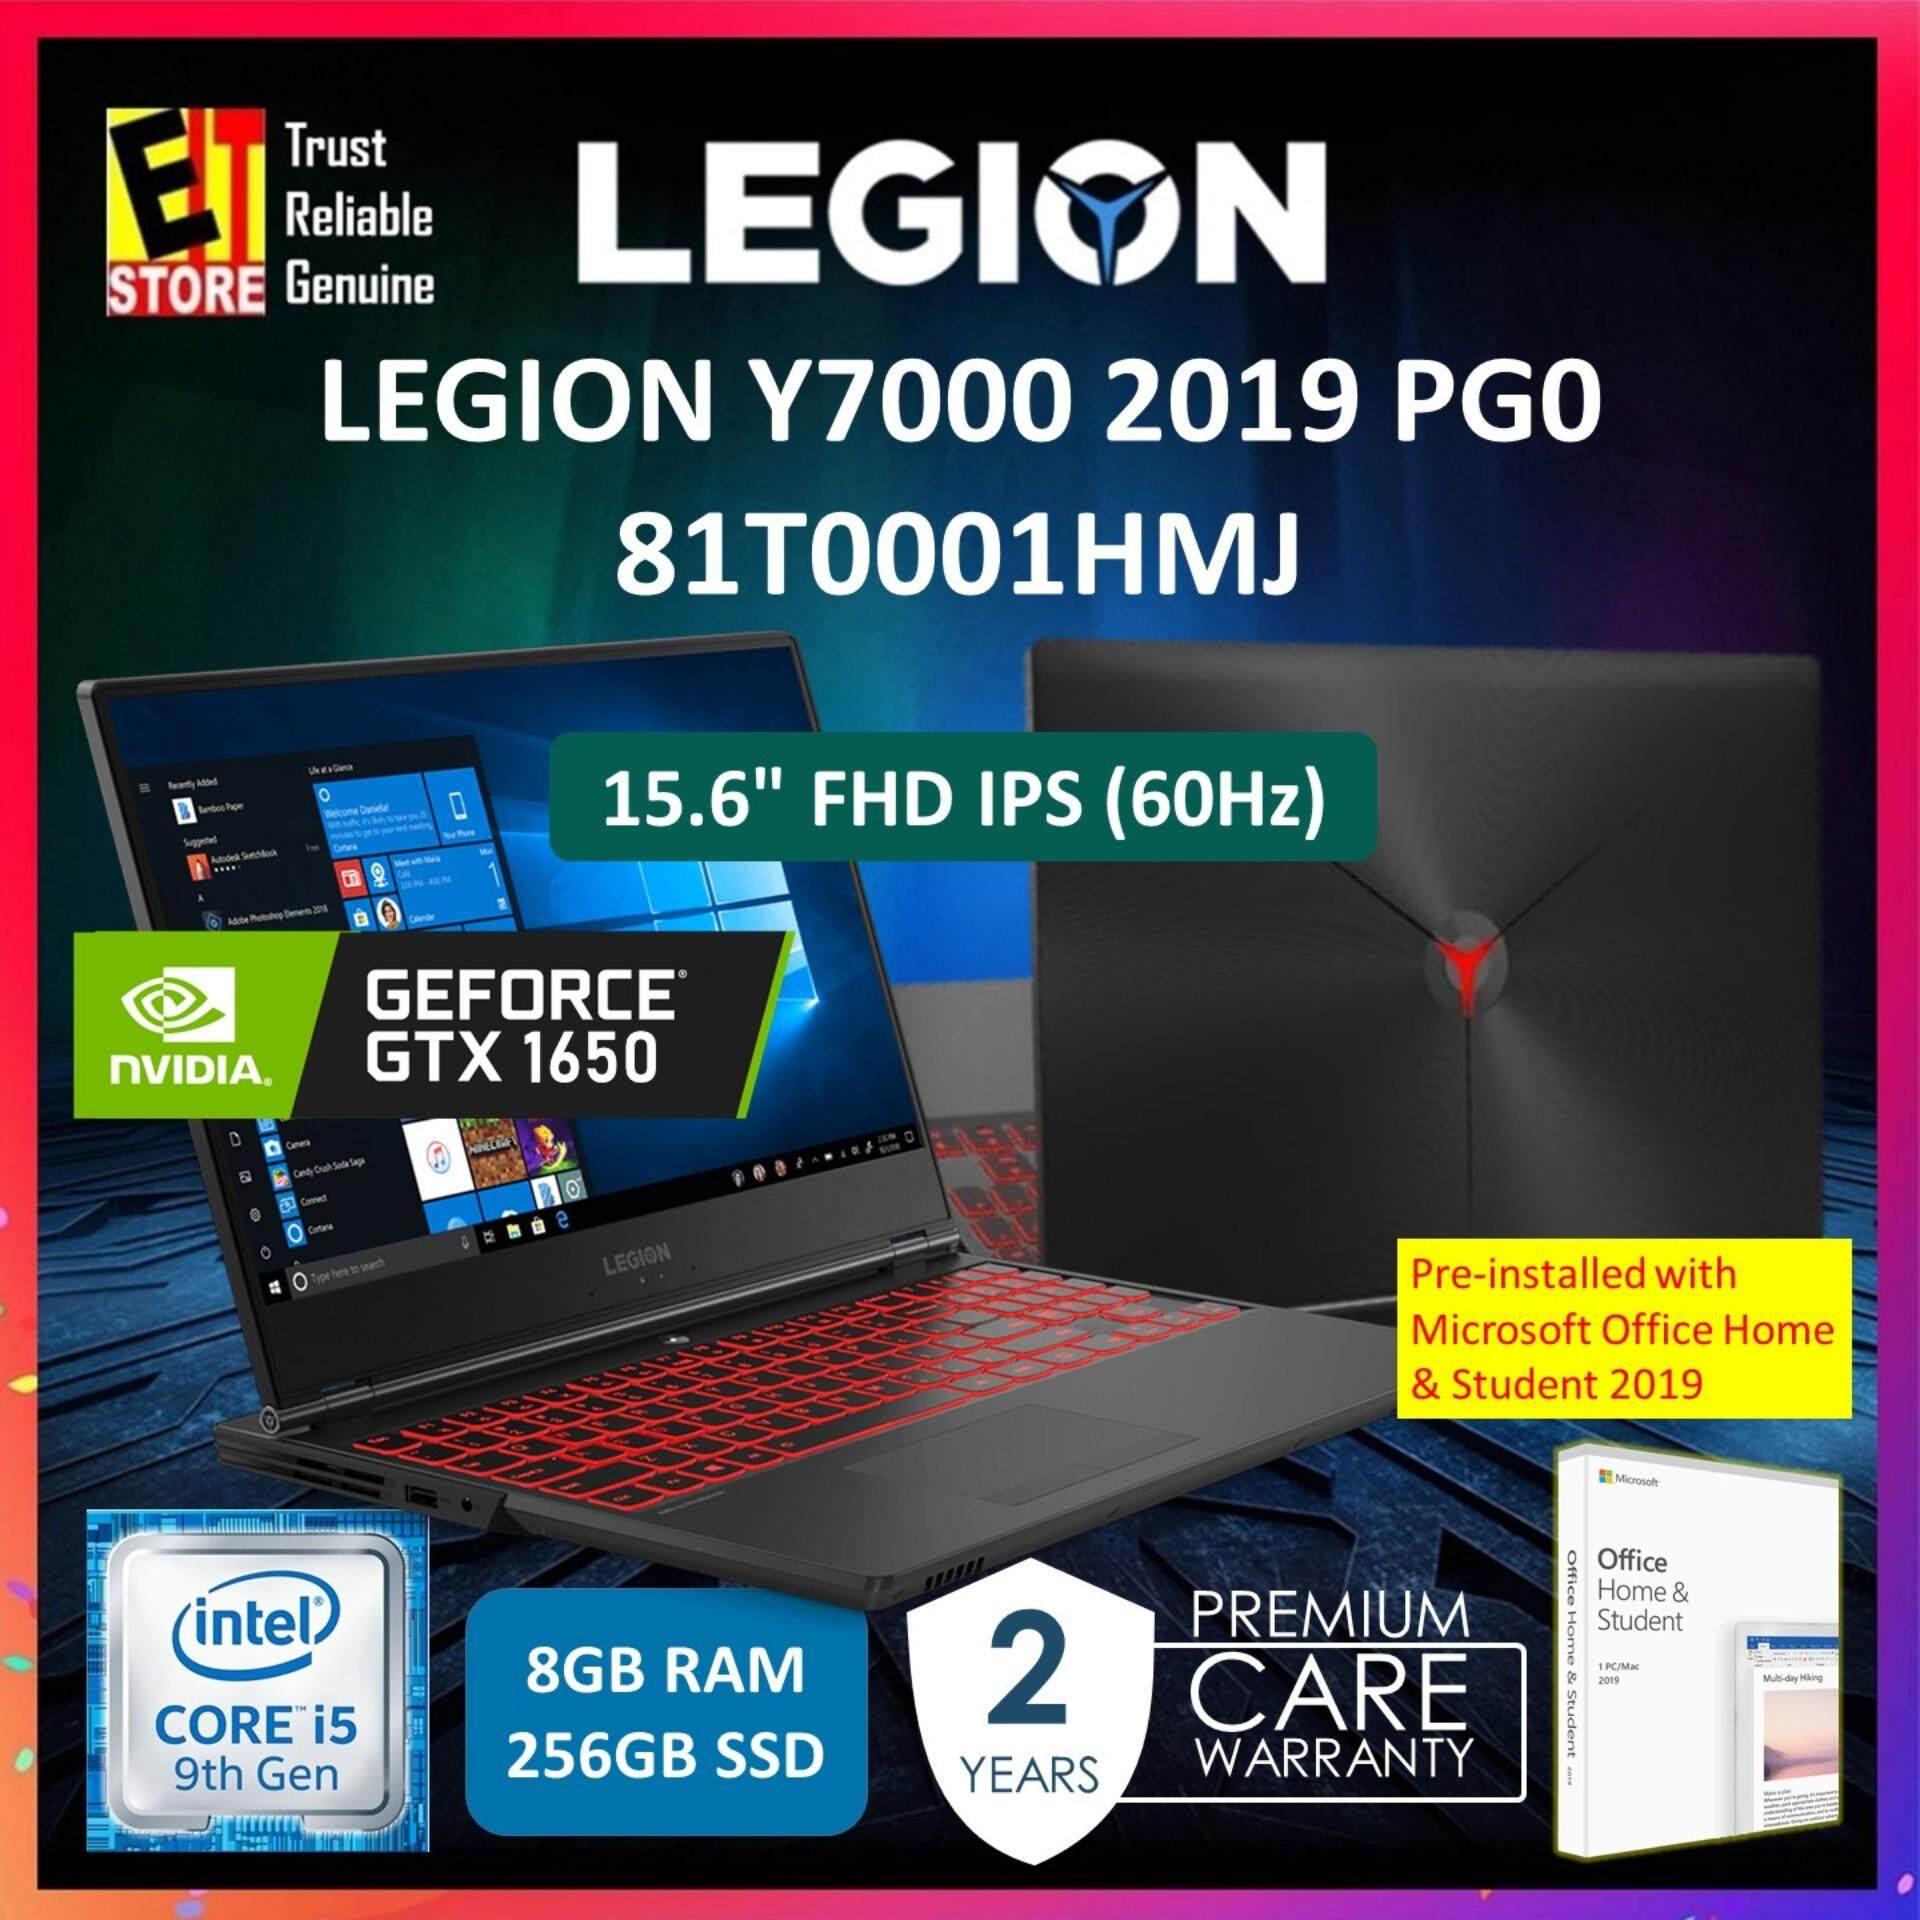 LENOVO LEGION Y7000 Gaming Laptop 81T0001HMJ I5-9300H /8GB/ 256GB PCIe SSD /4GB nVIDIA GTX 1650 /15.6  FHD /W10/2YRS /WITH OFFICE HOME & STUDENT 2019 Malaysia